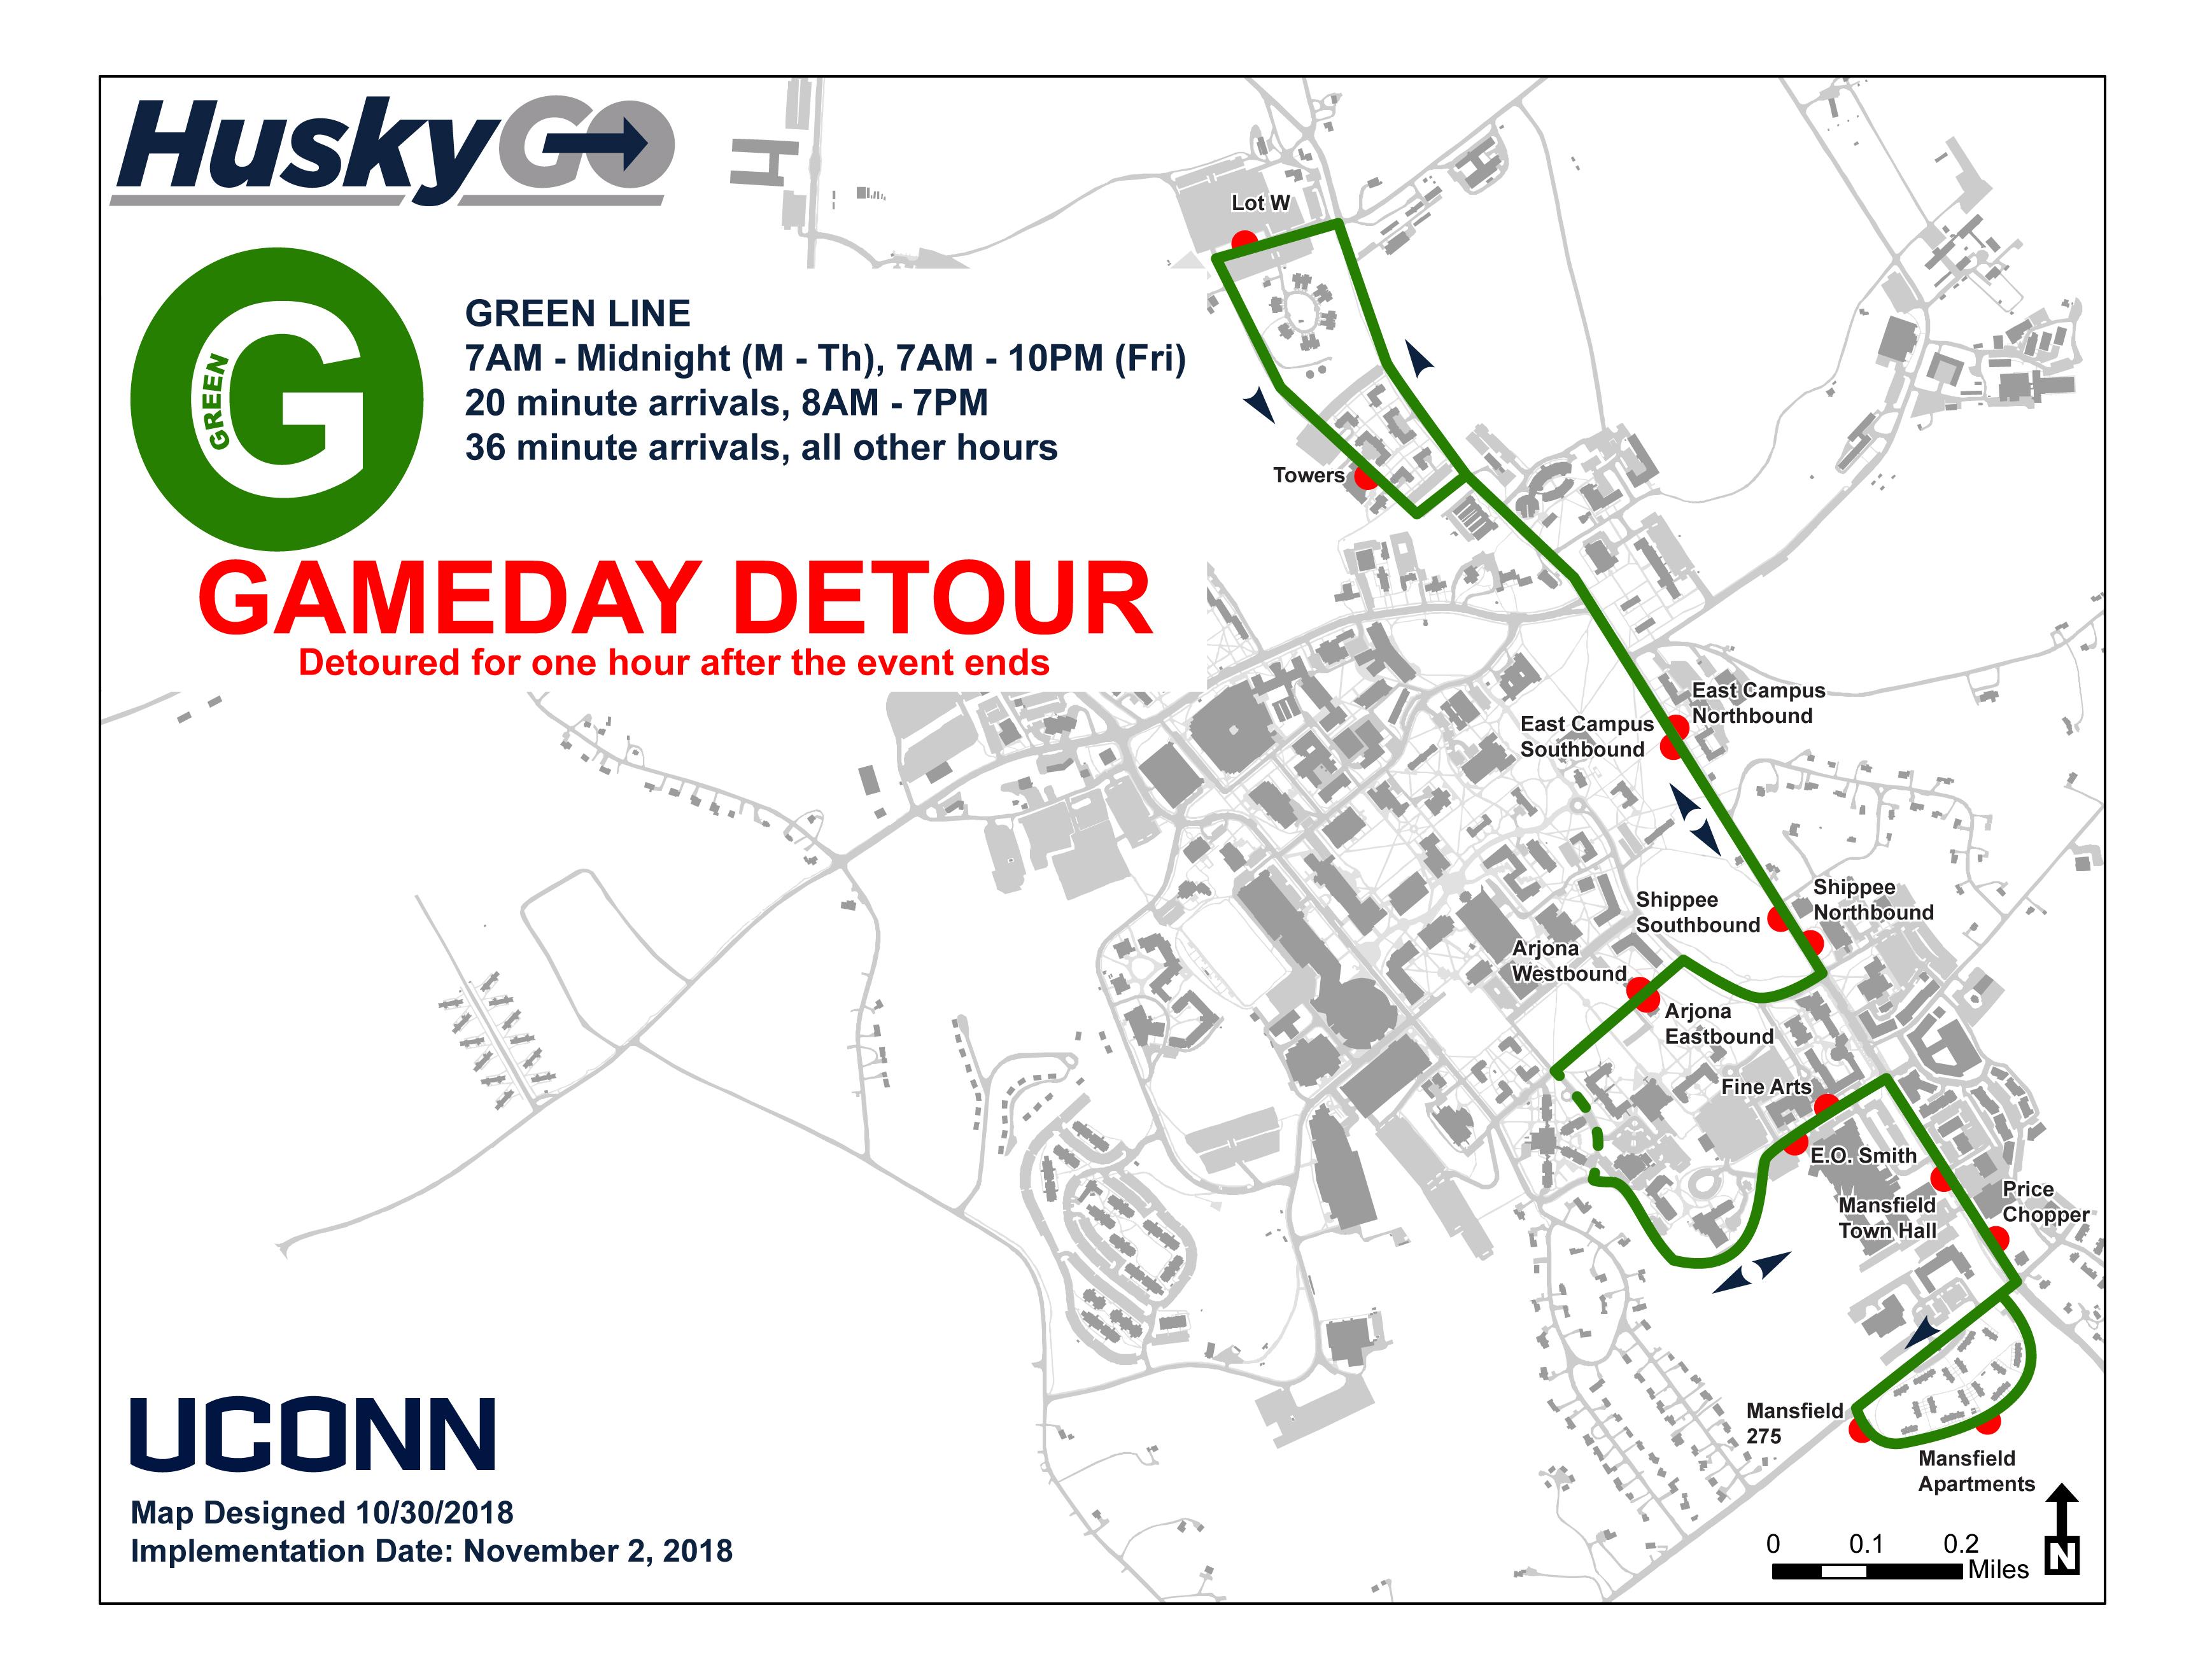 uconn depot campus map July 9 2020 Transportation Services